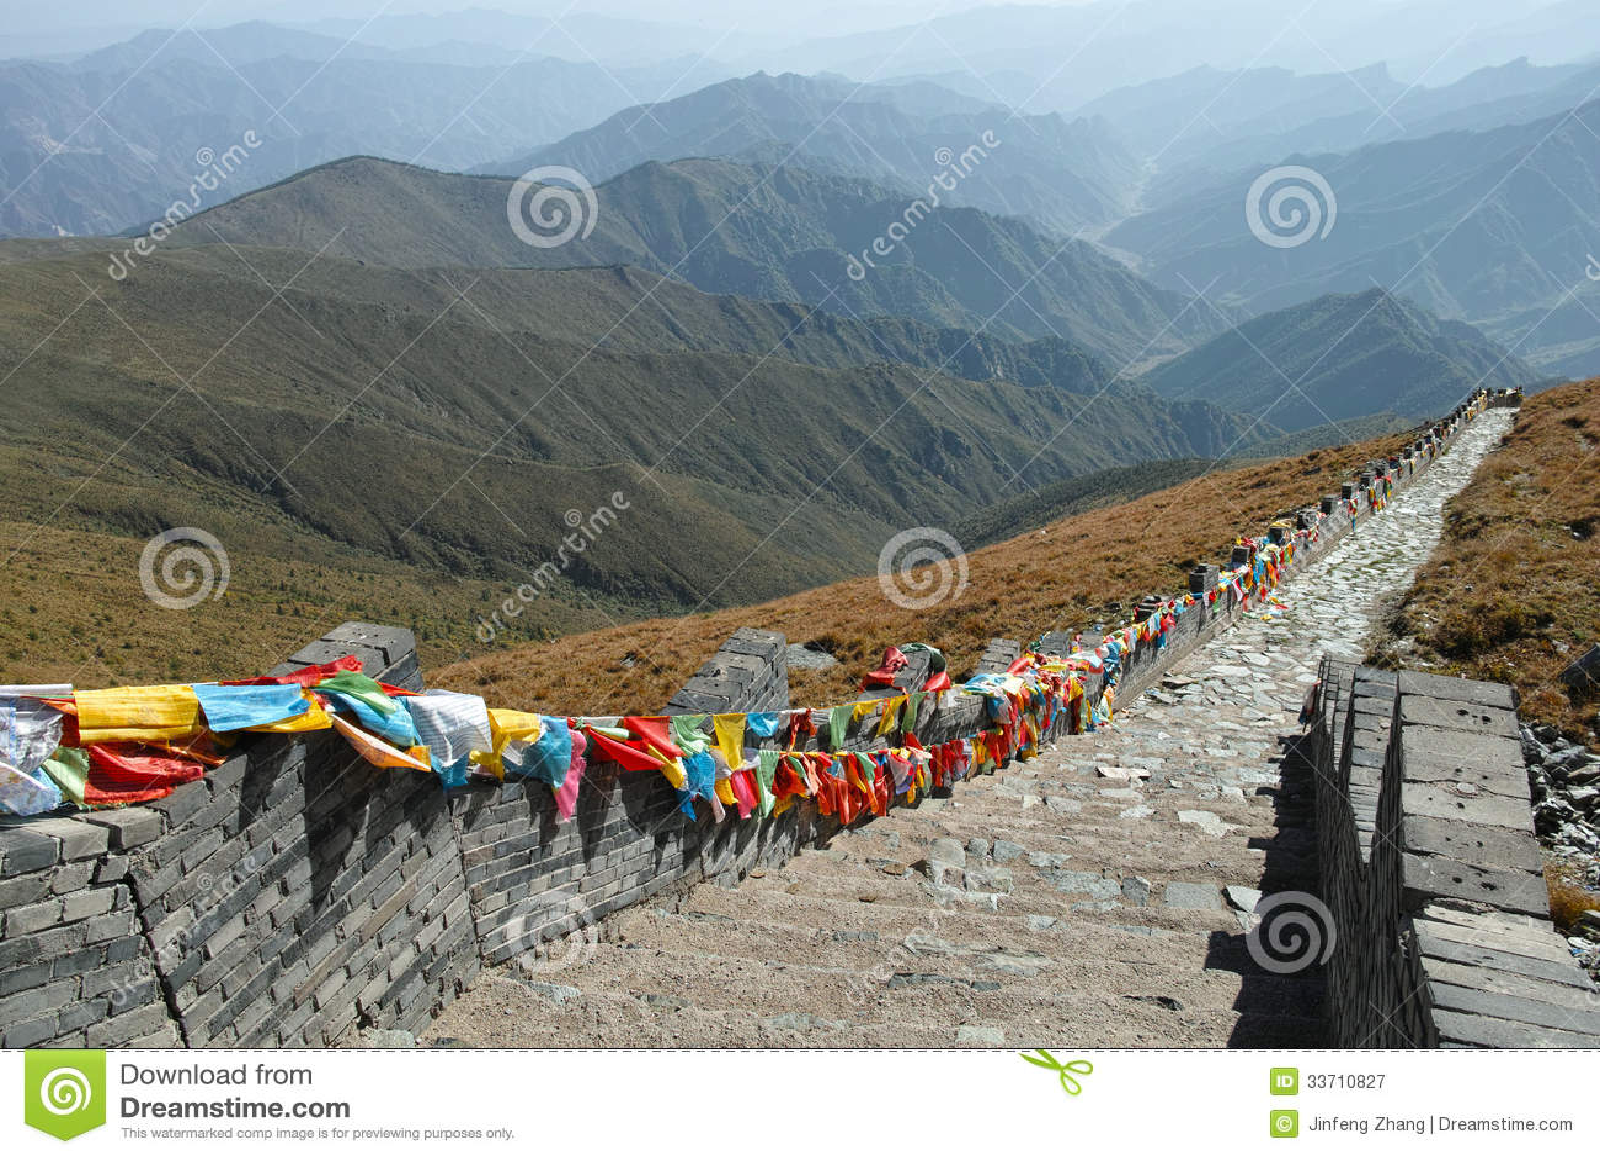 scenery of wutaishan stock image image of morning